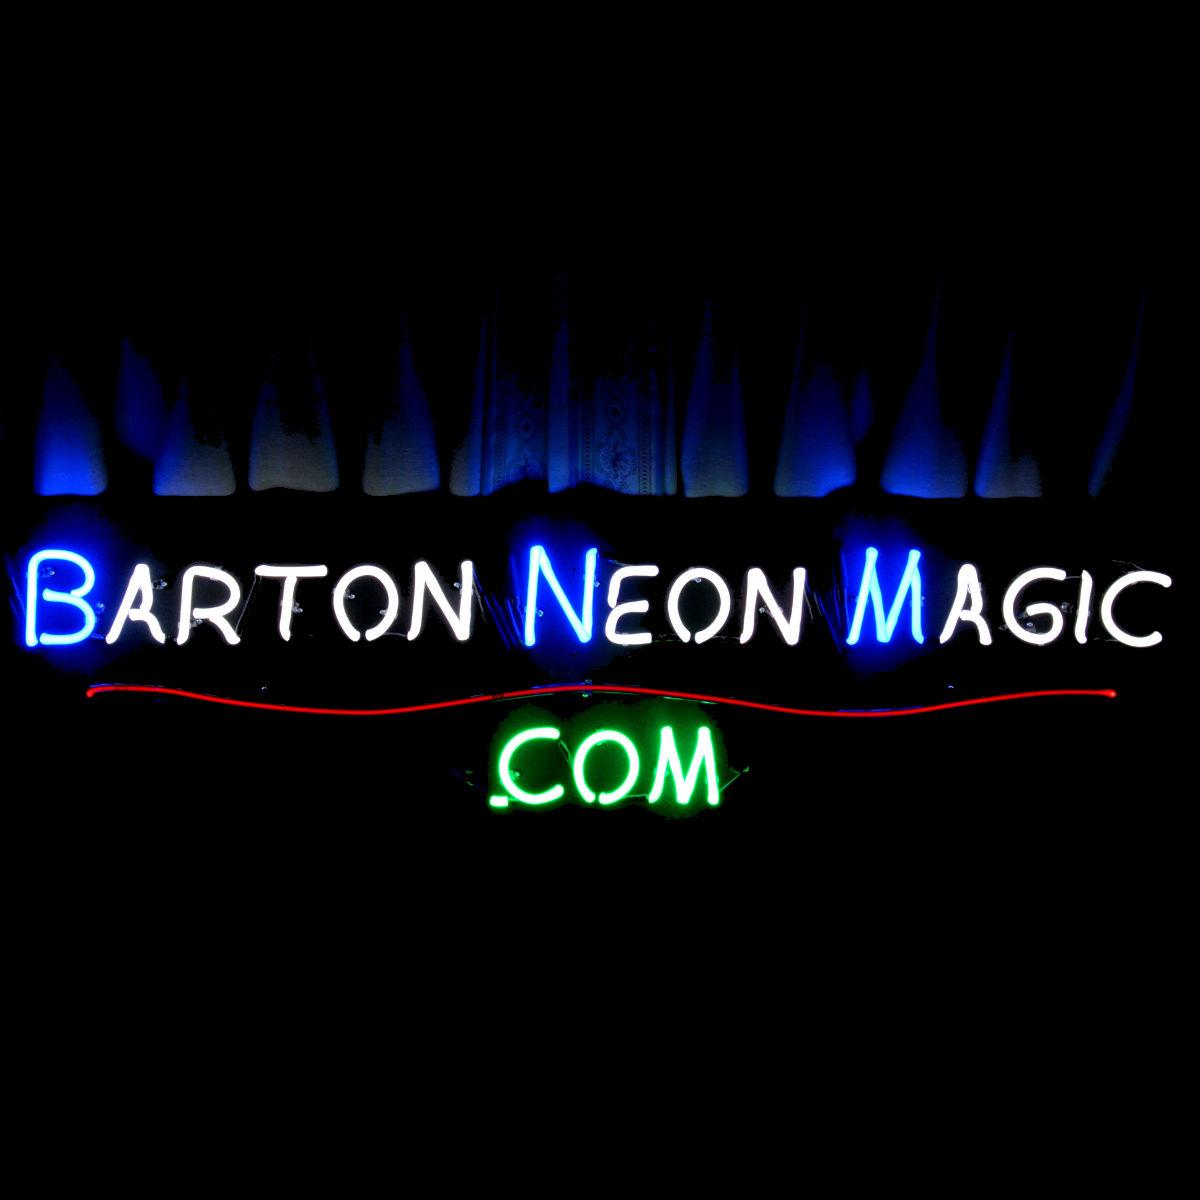 BartonNeonMagic.com - Fine Quality Neon Light Sculptures by John Barton - Famous American Neon Glass Artist